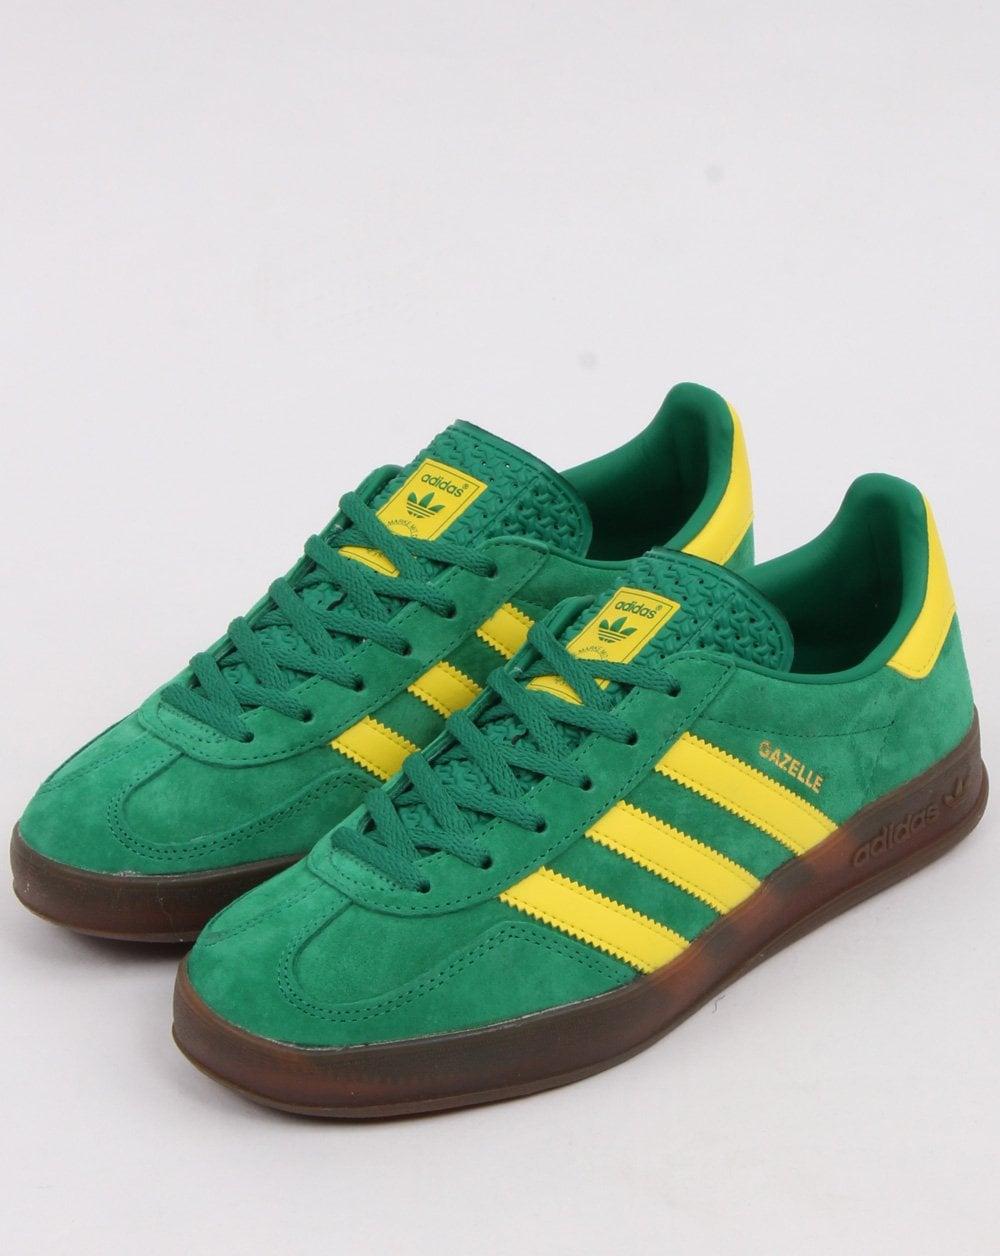 Adidas Gazelle Indoor Trainers Green/Yellow